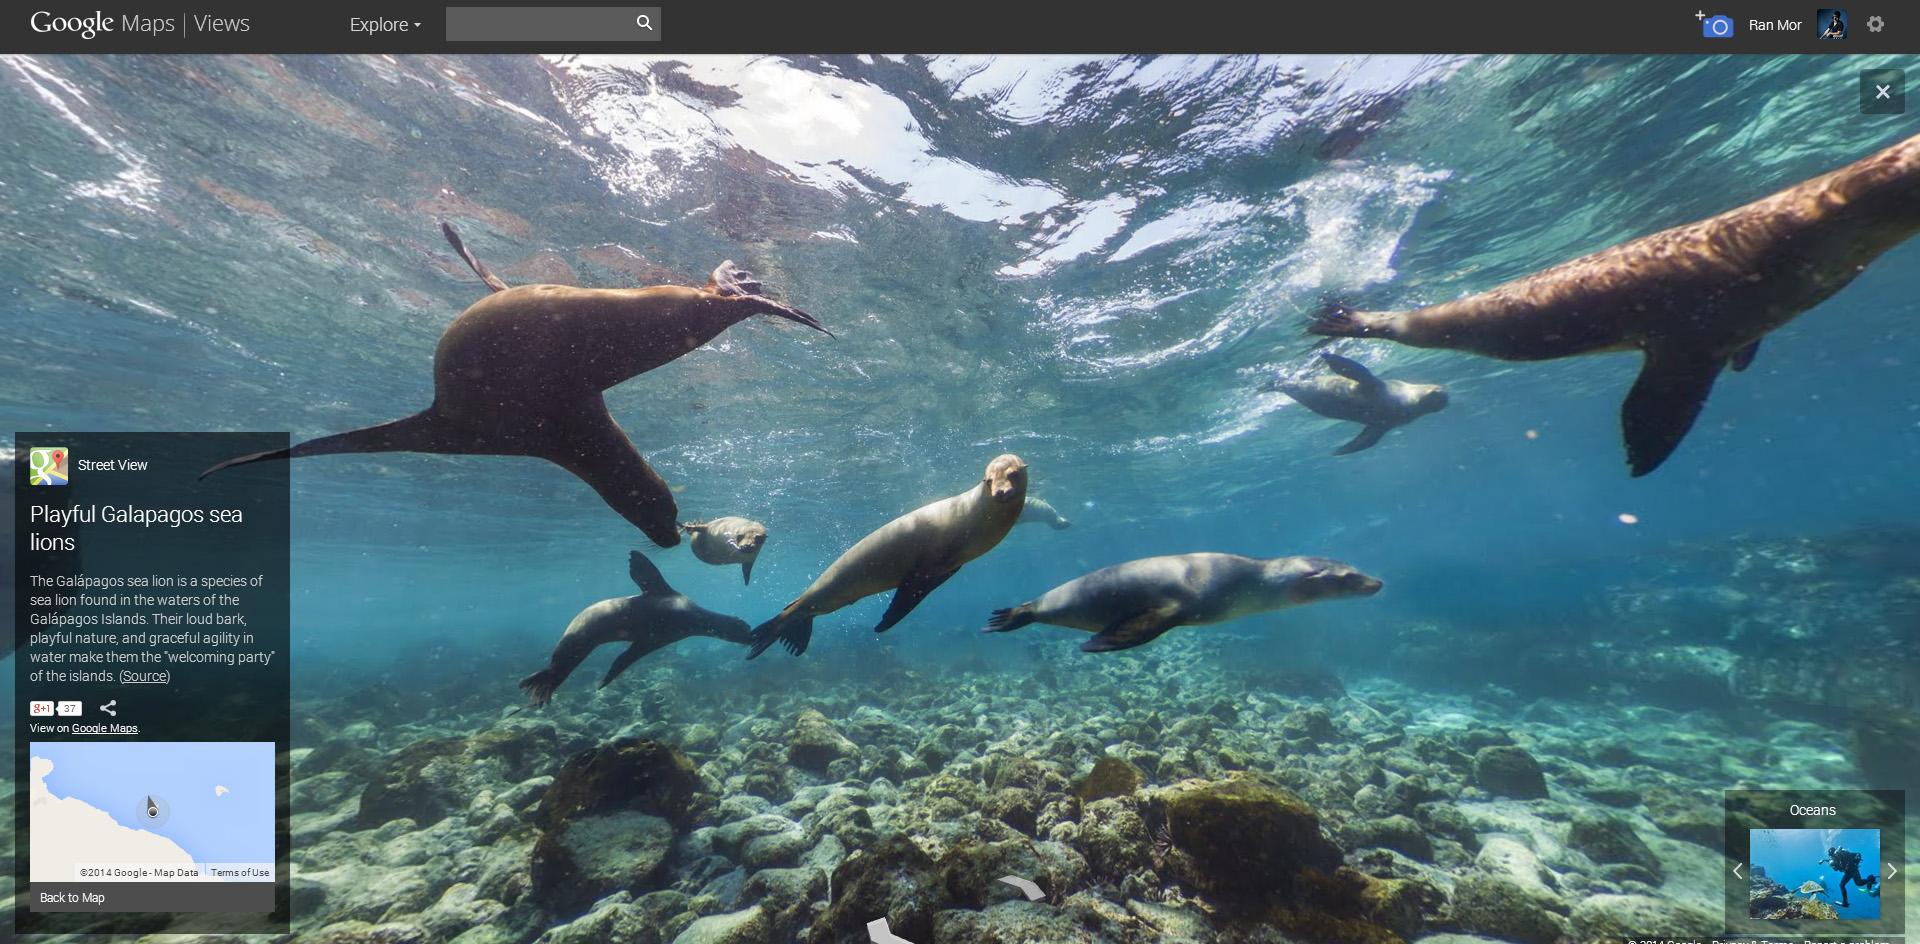 Google continues mapping the ocean floor | Mozaik UW on google oceans 3d, google earth atlantis coordinates, google earth finds atlantis, google earth sea floor, google earth ocean topography, google earth ocean map, google ocean atlantis,